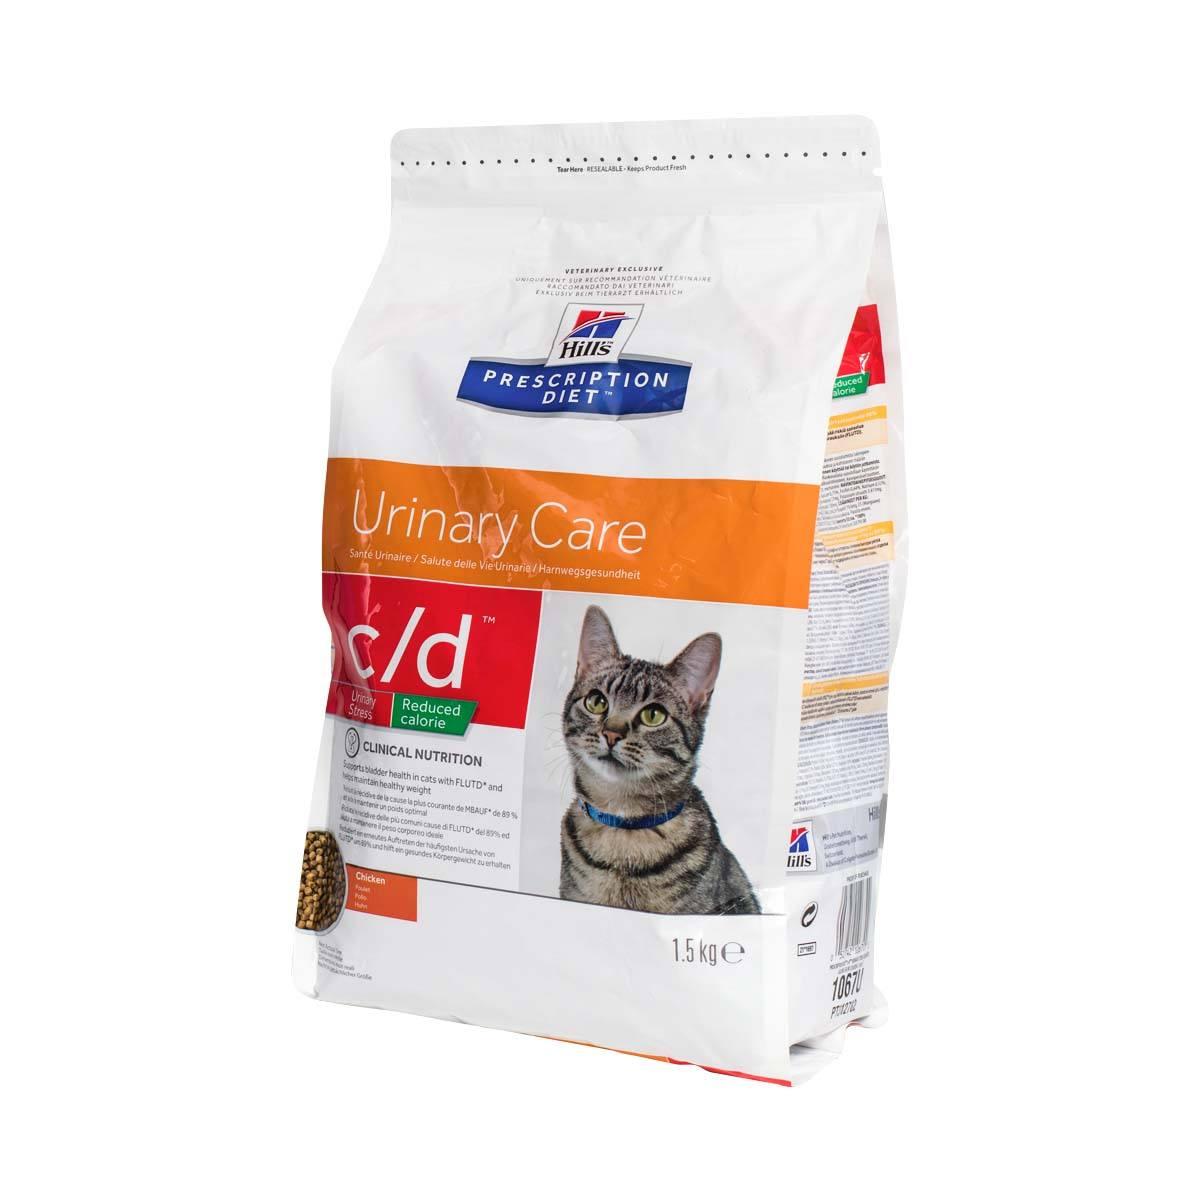 Royal Canin So Vs Hills Cd Cat